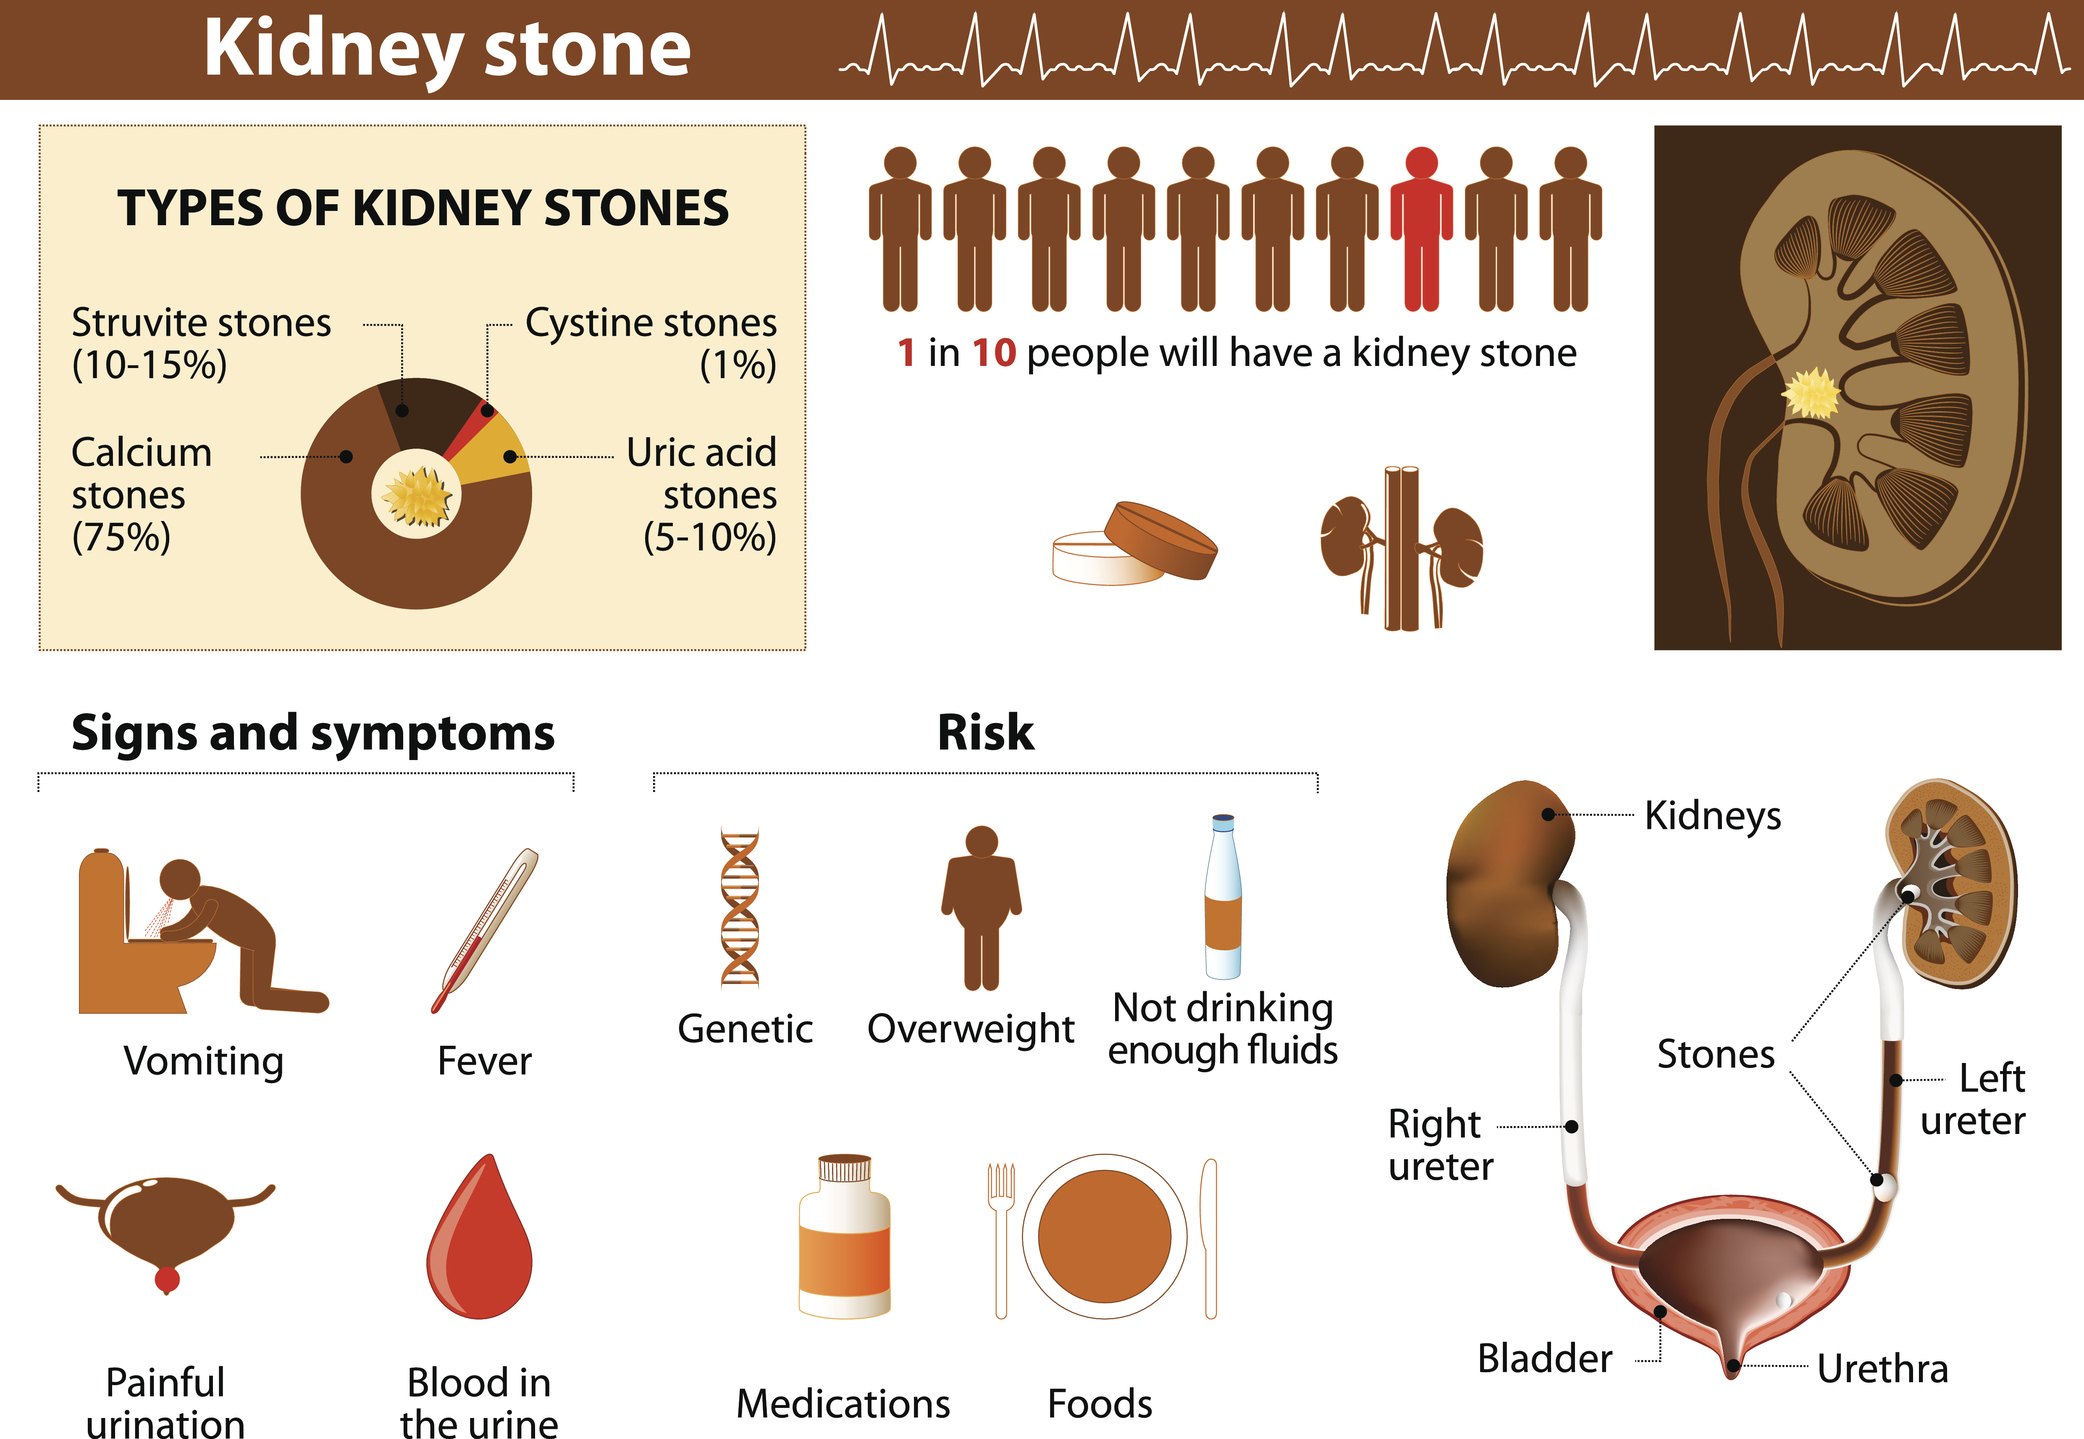 prostate stones natural treatment)